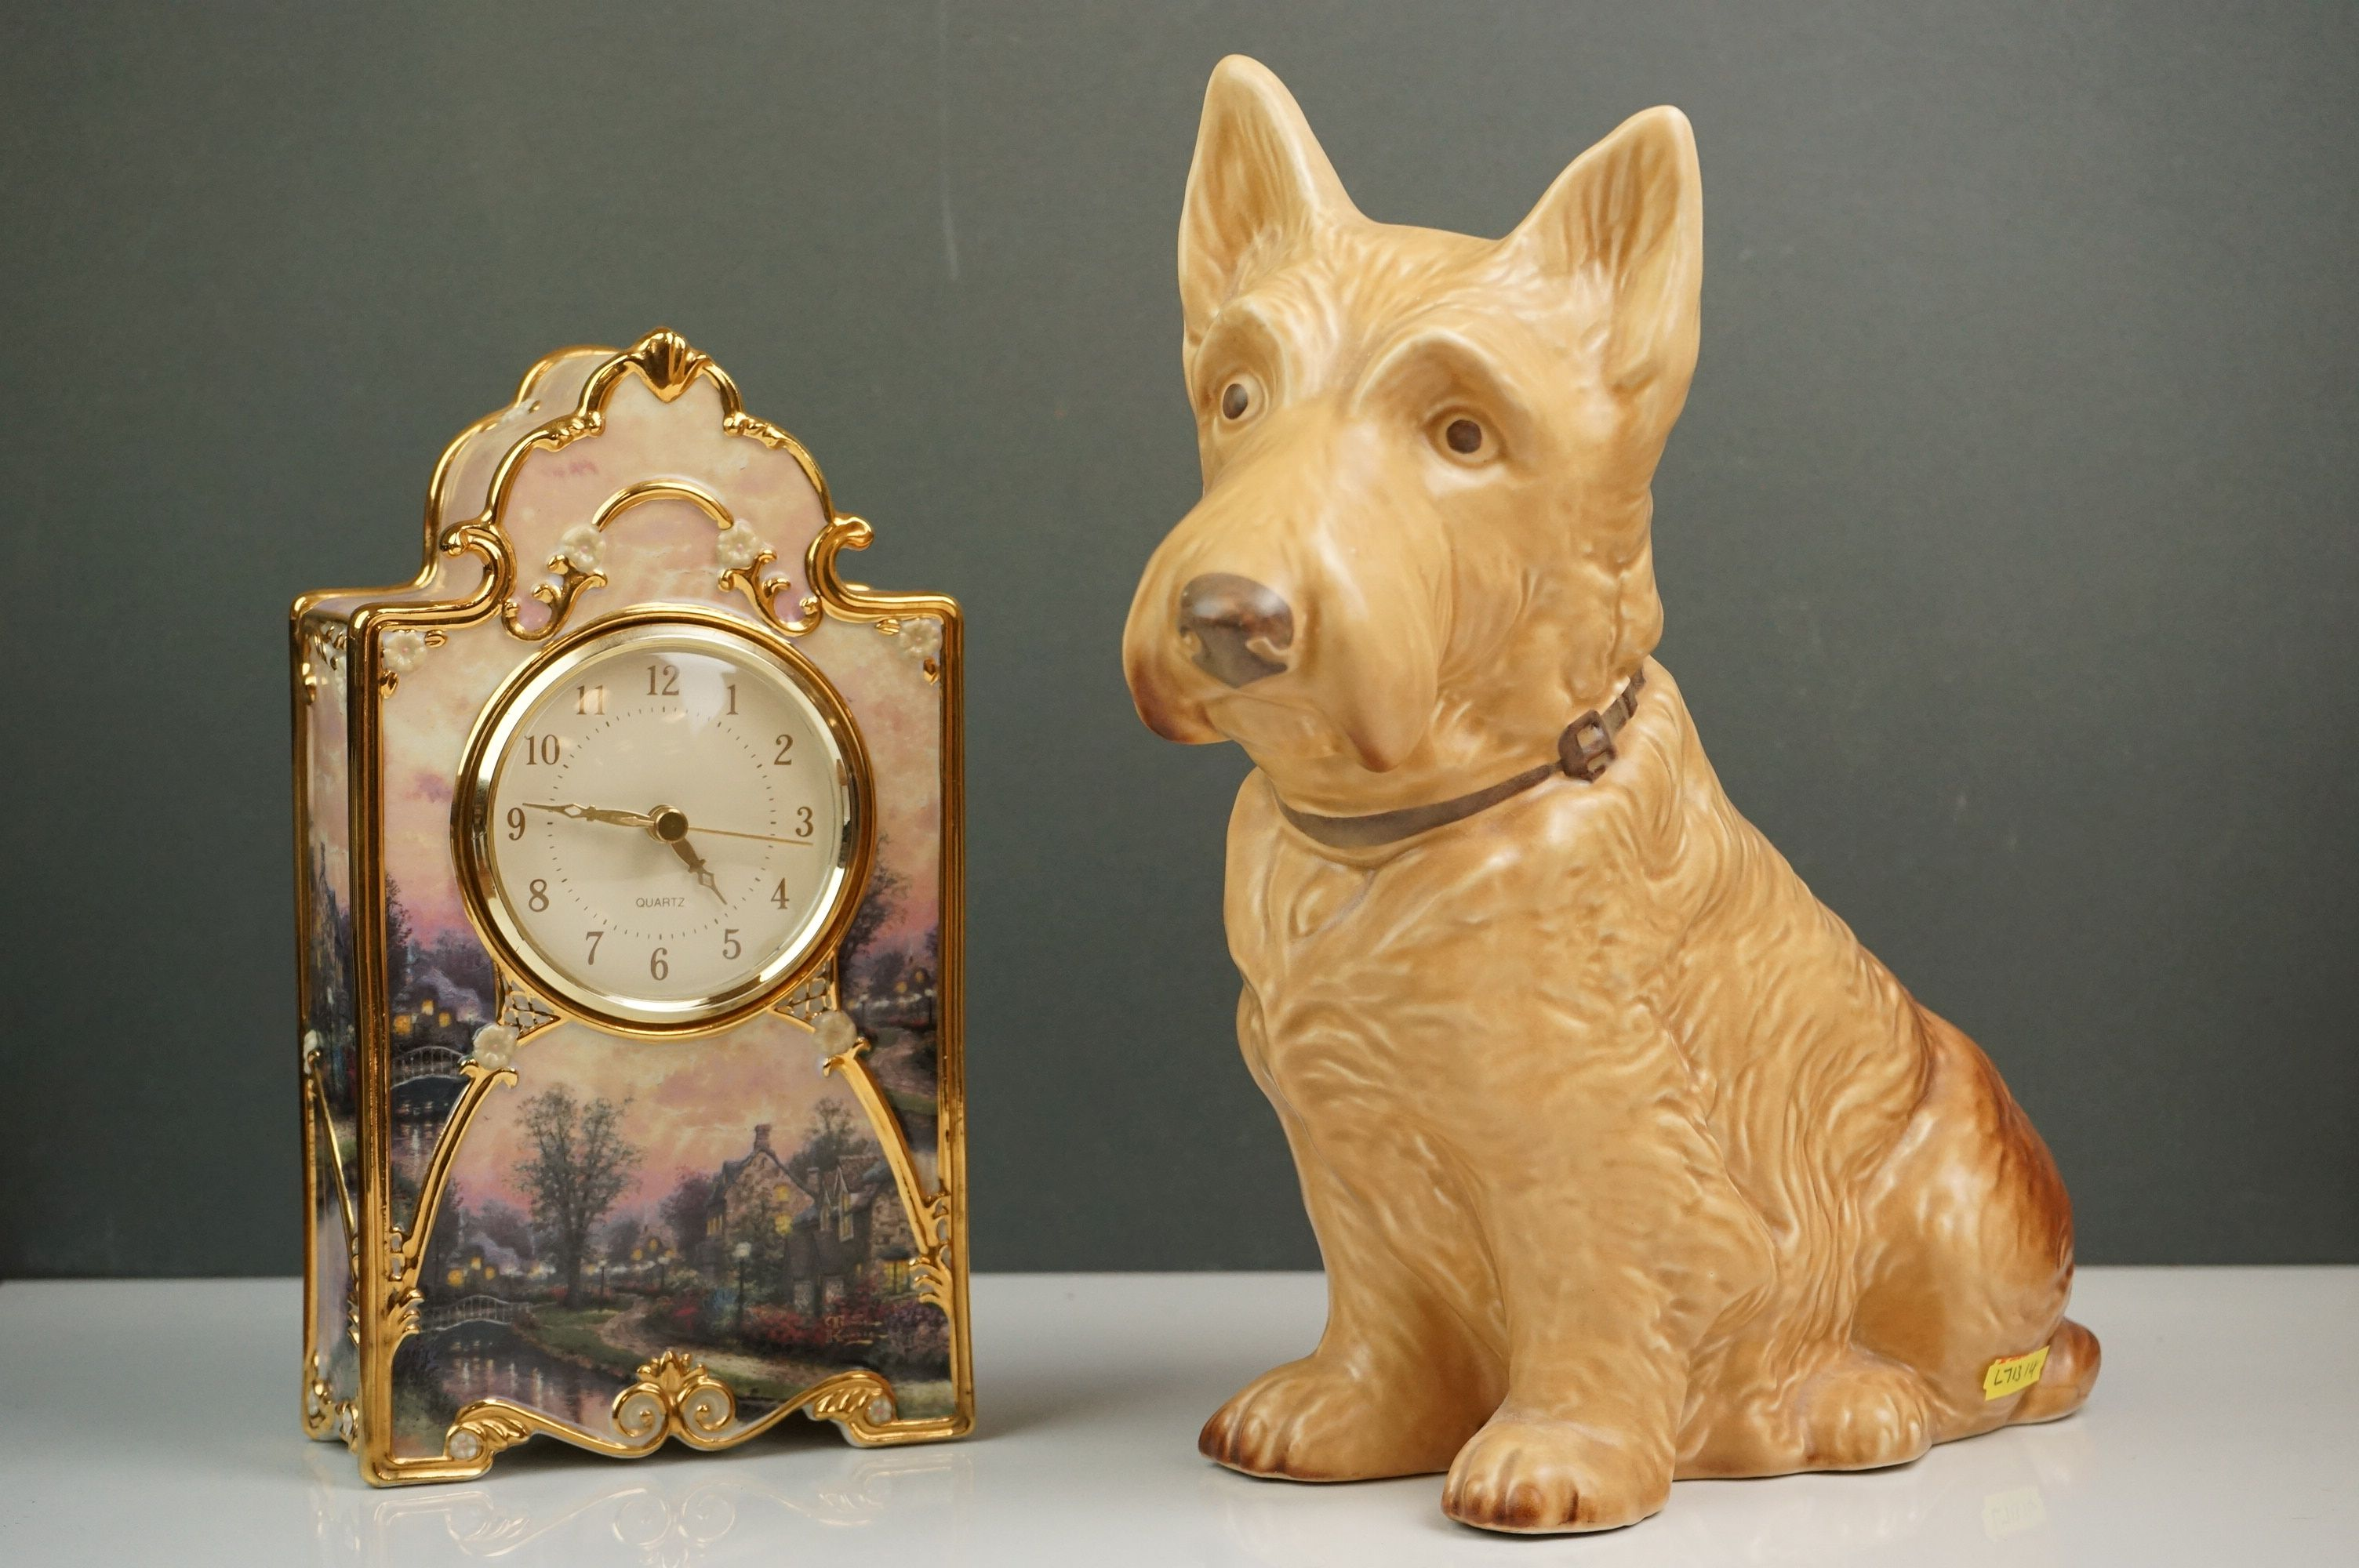 Bradford Exchange Lamplight Lane Heirloom porcelain clock by Thomas Kinkade, issue no. A9321,